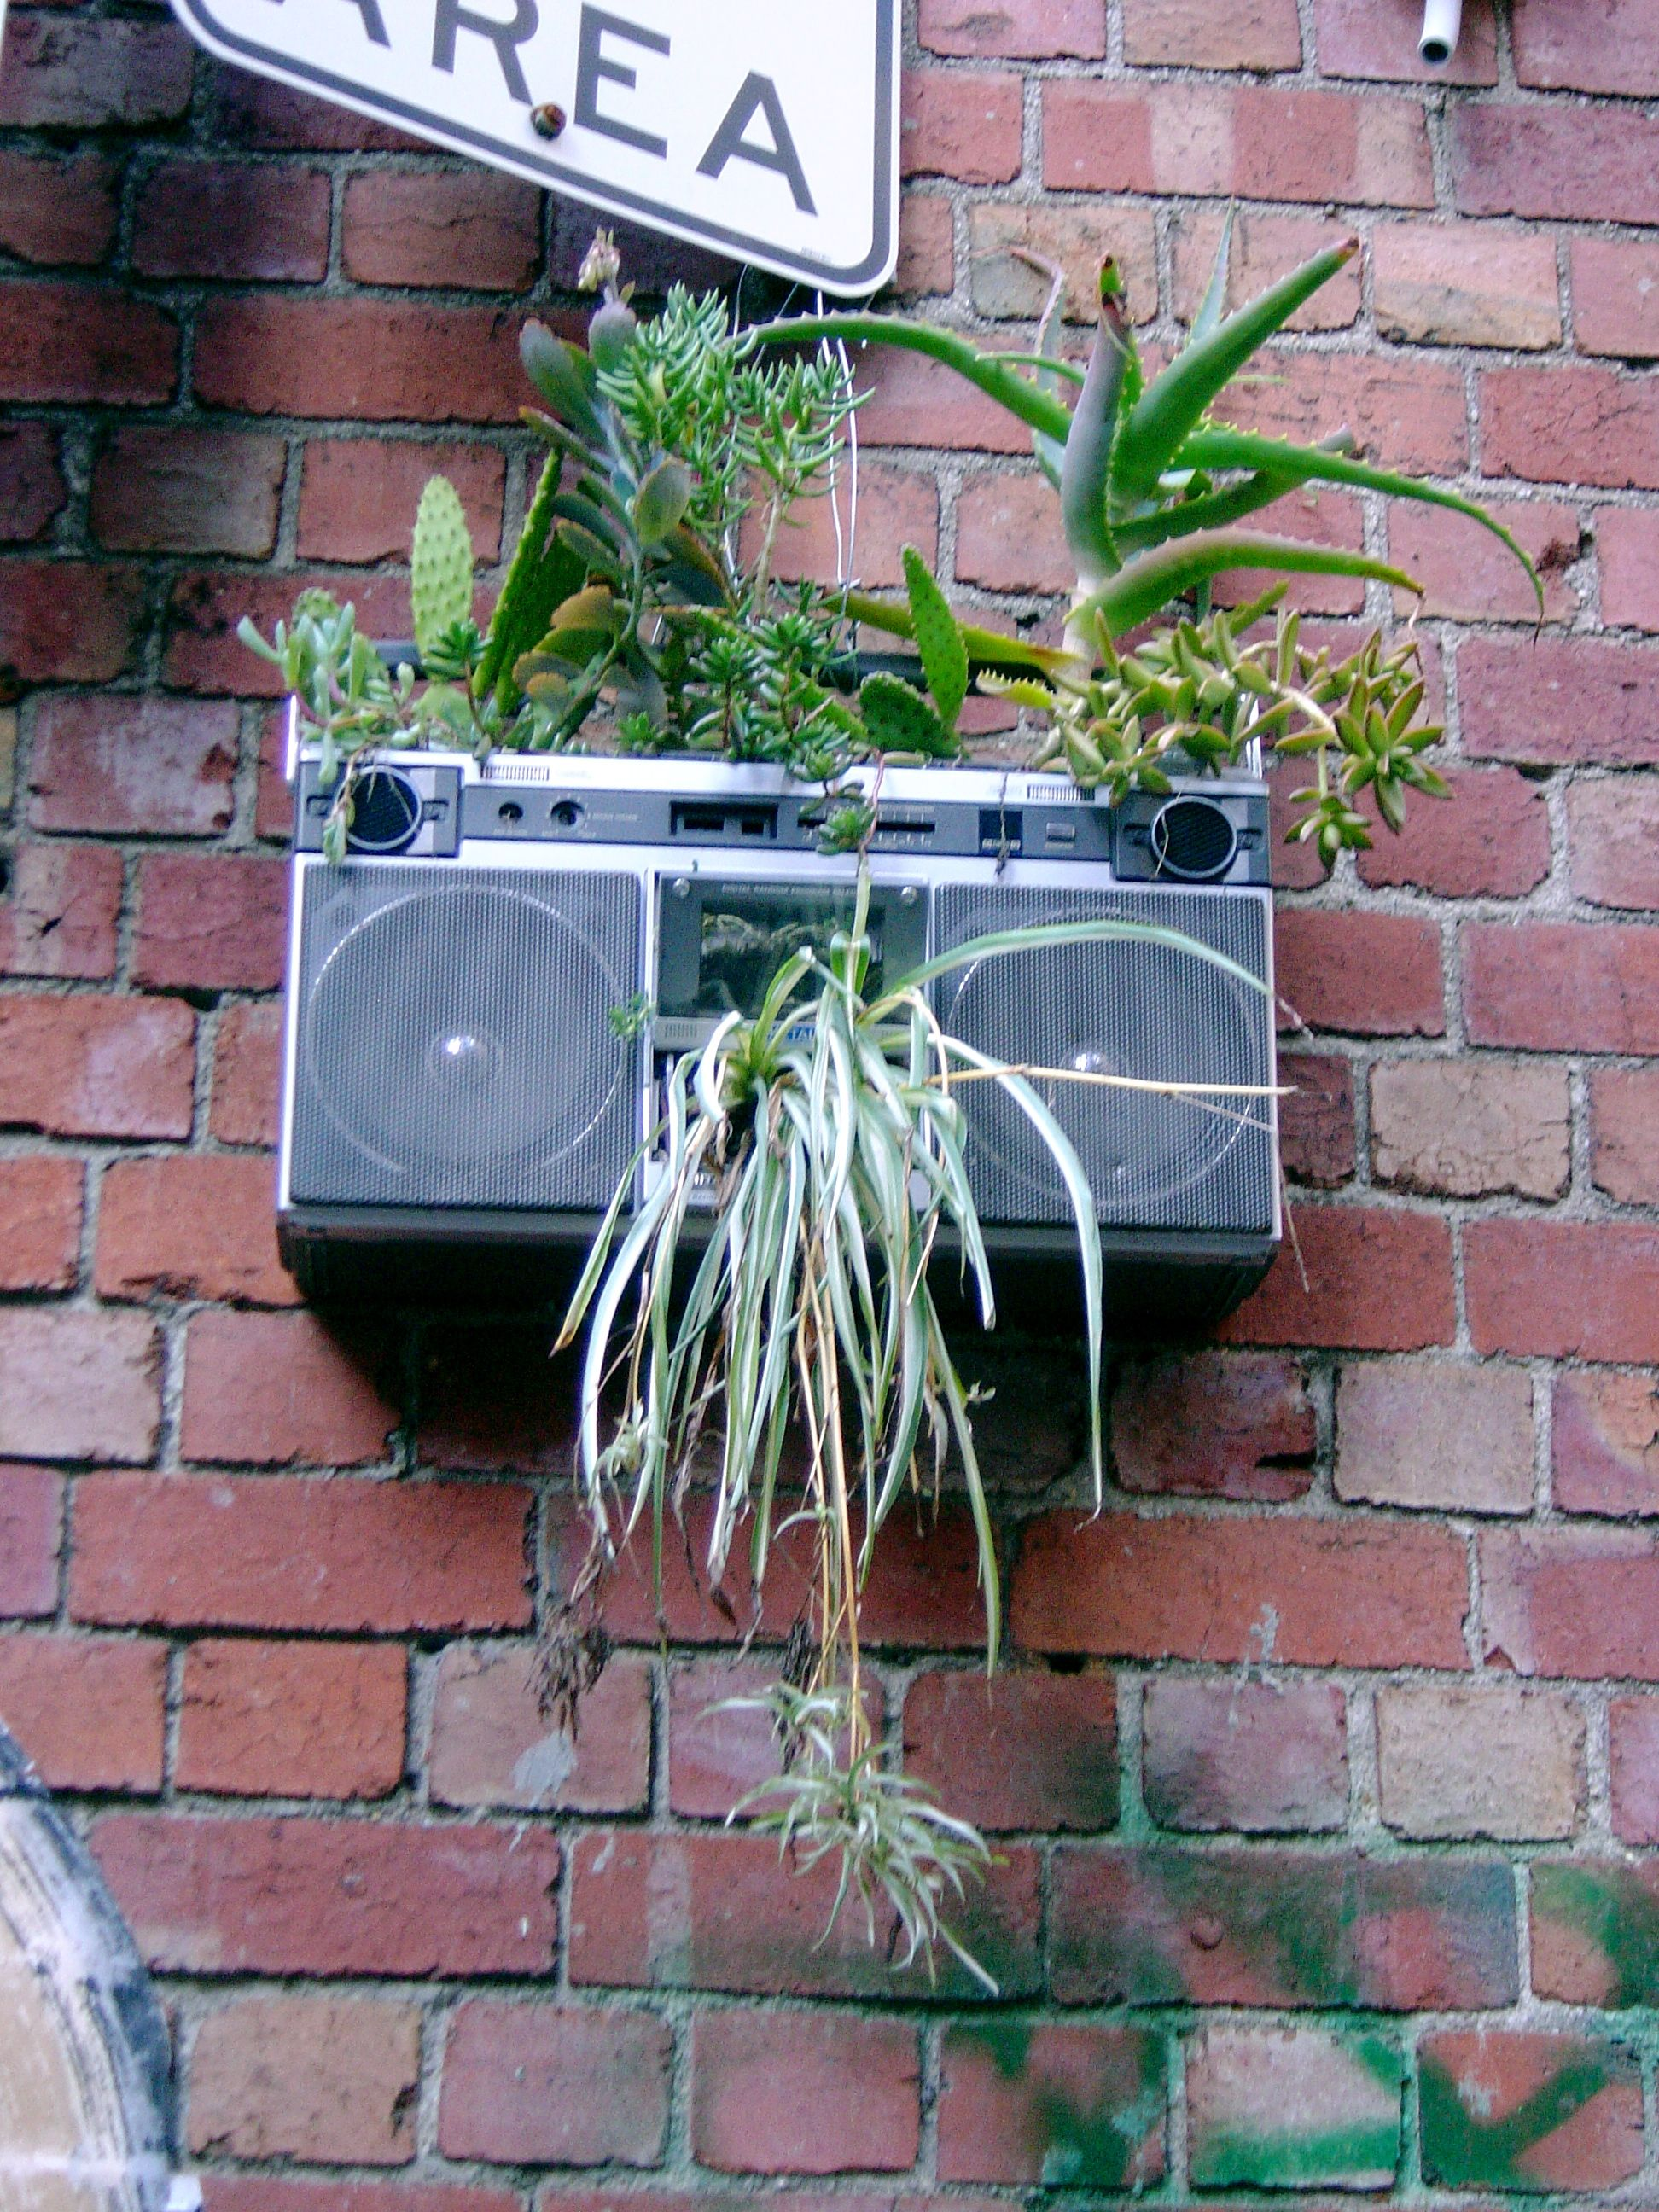 Pin by Santino Cassanova on Urban Gardening | Pinterest | Google ...